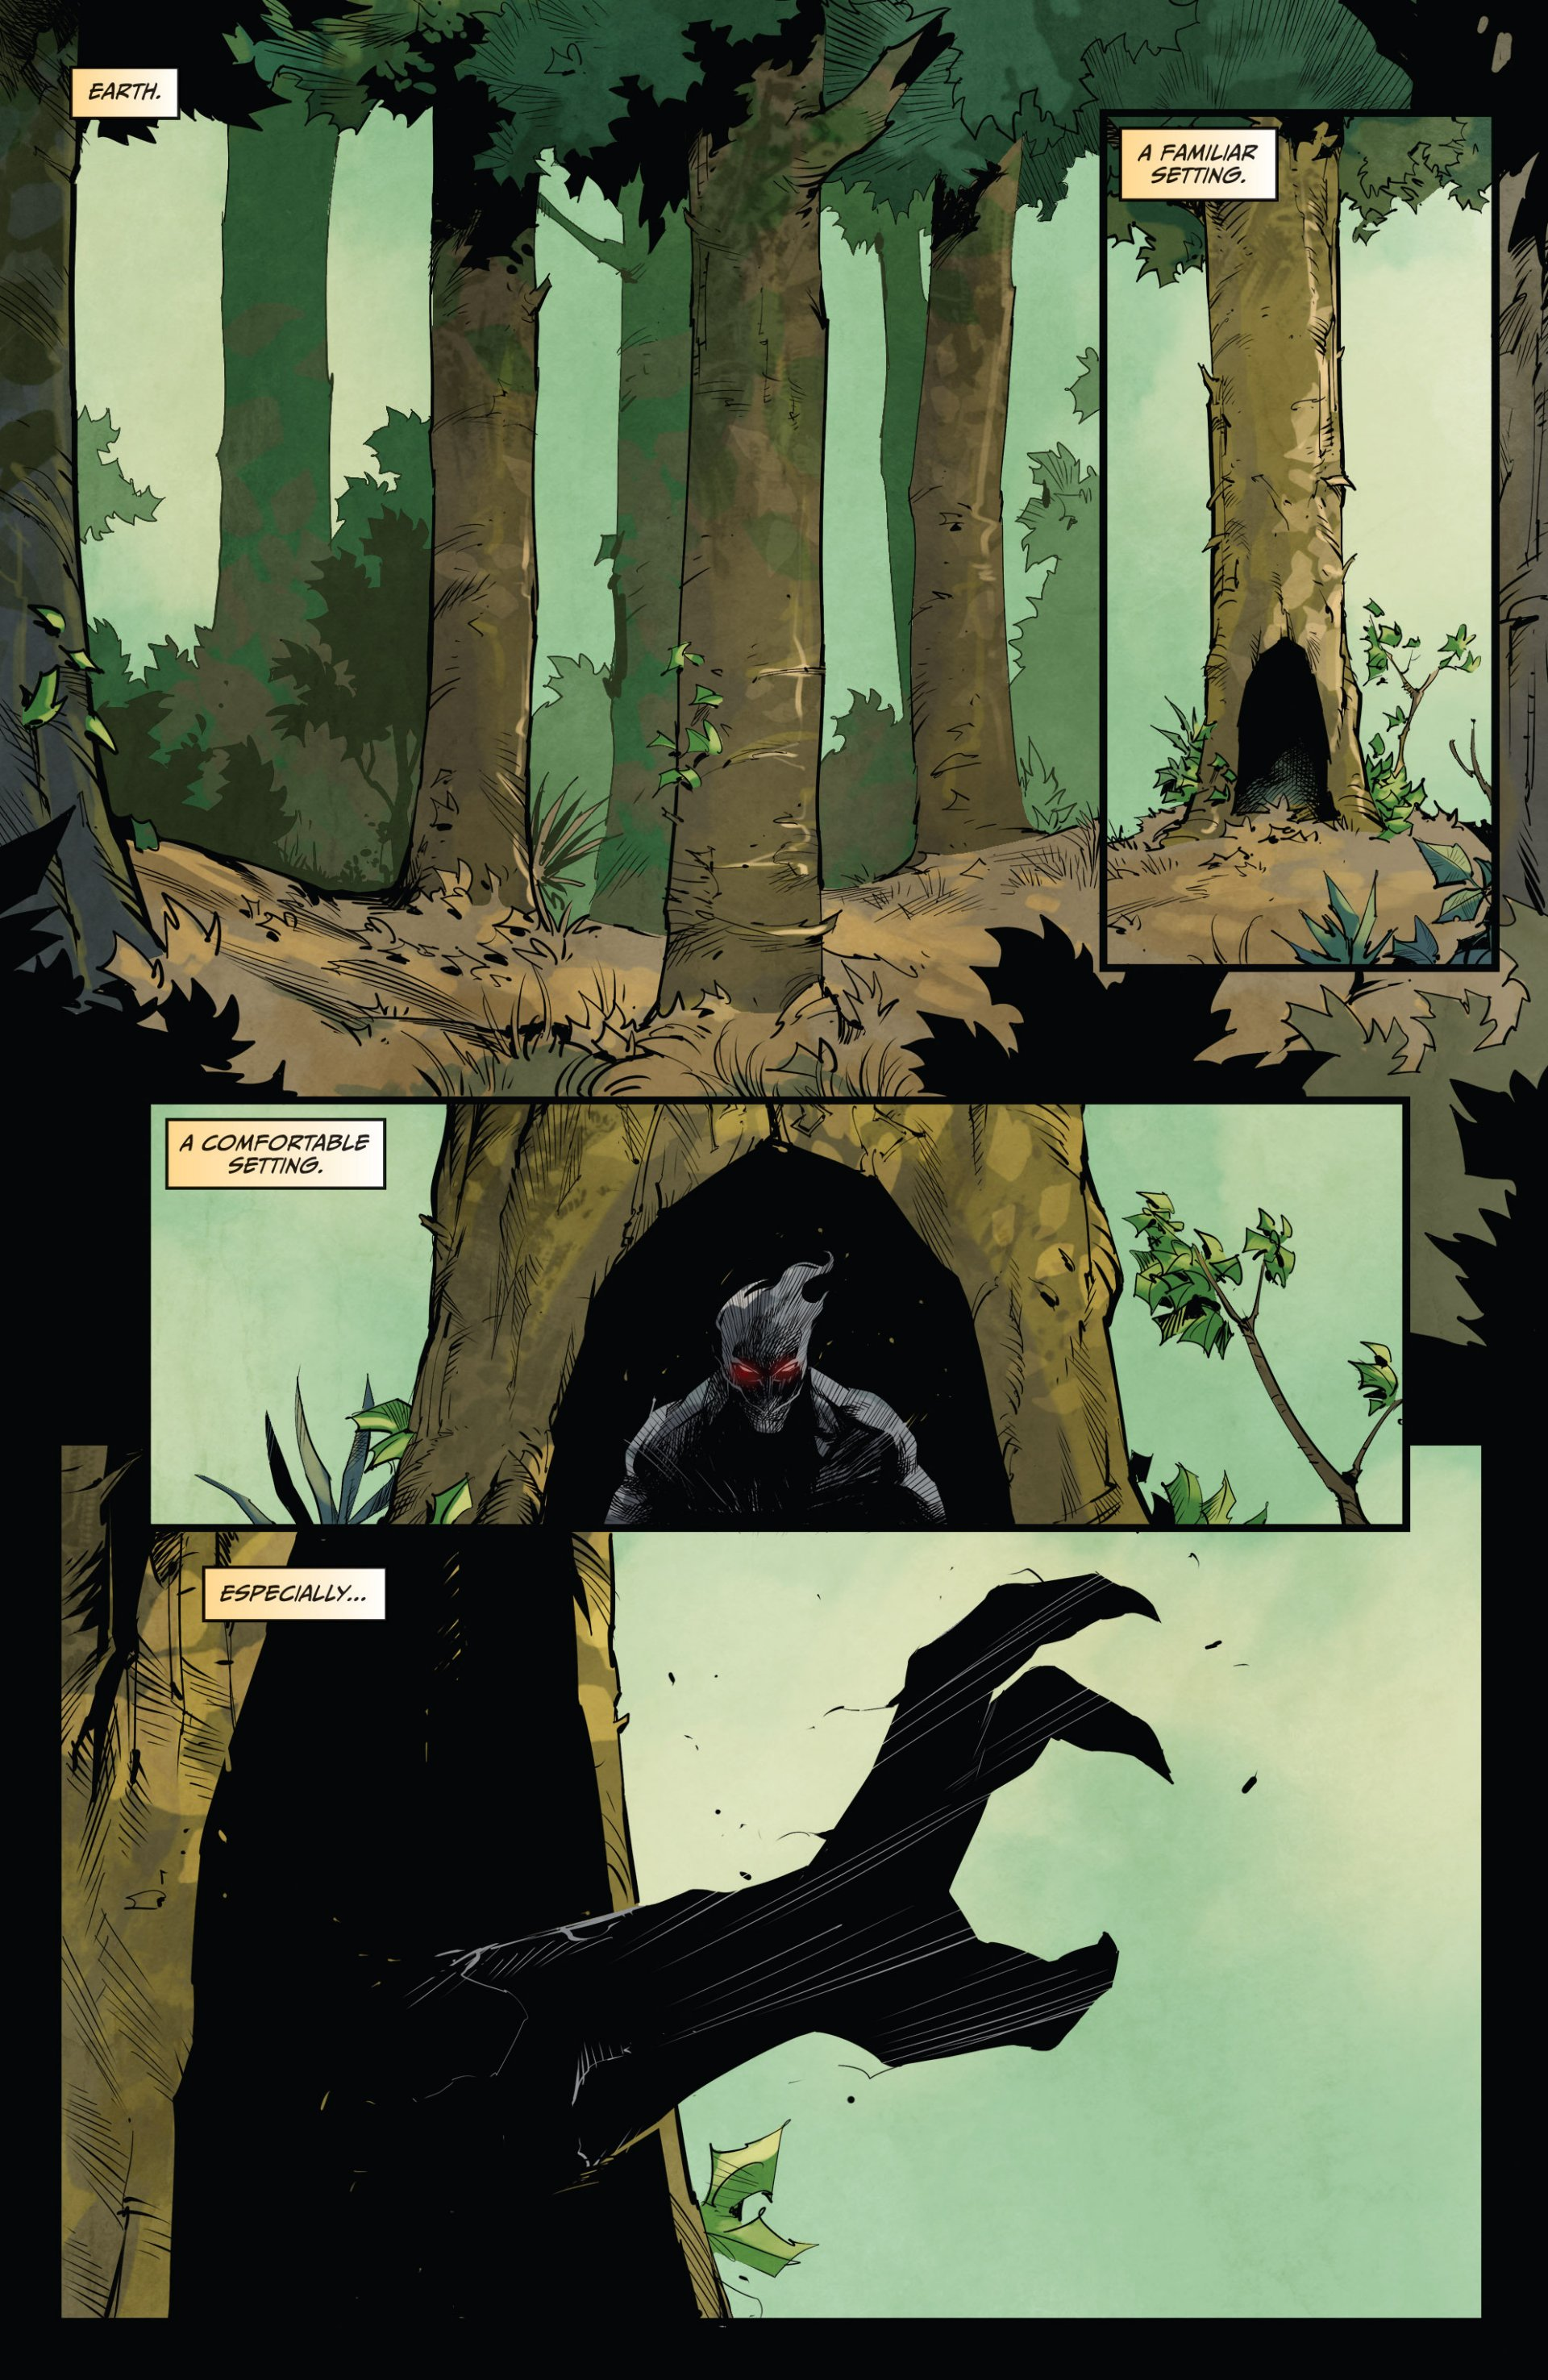 Read online Grimm Fairy Tales vs. Wonderland comic -  Issue #1 - 15